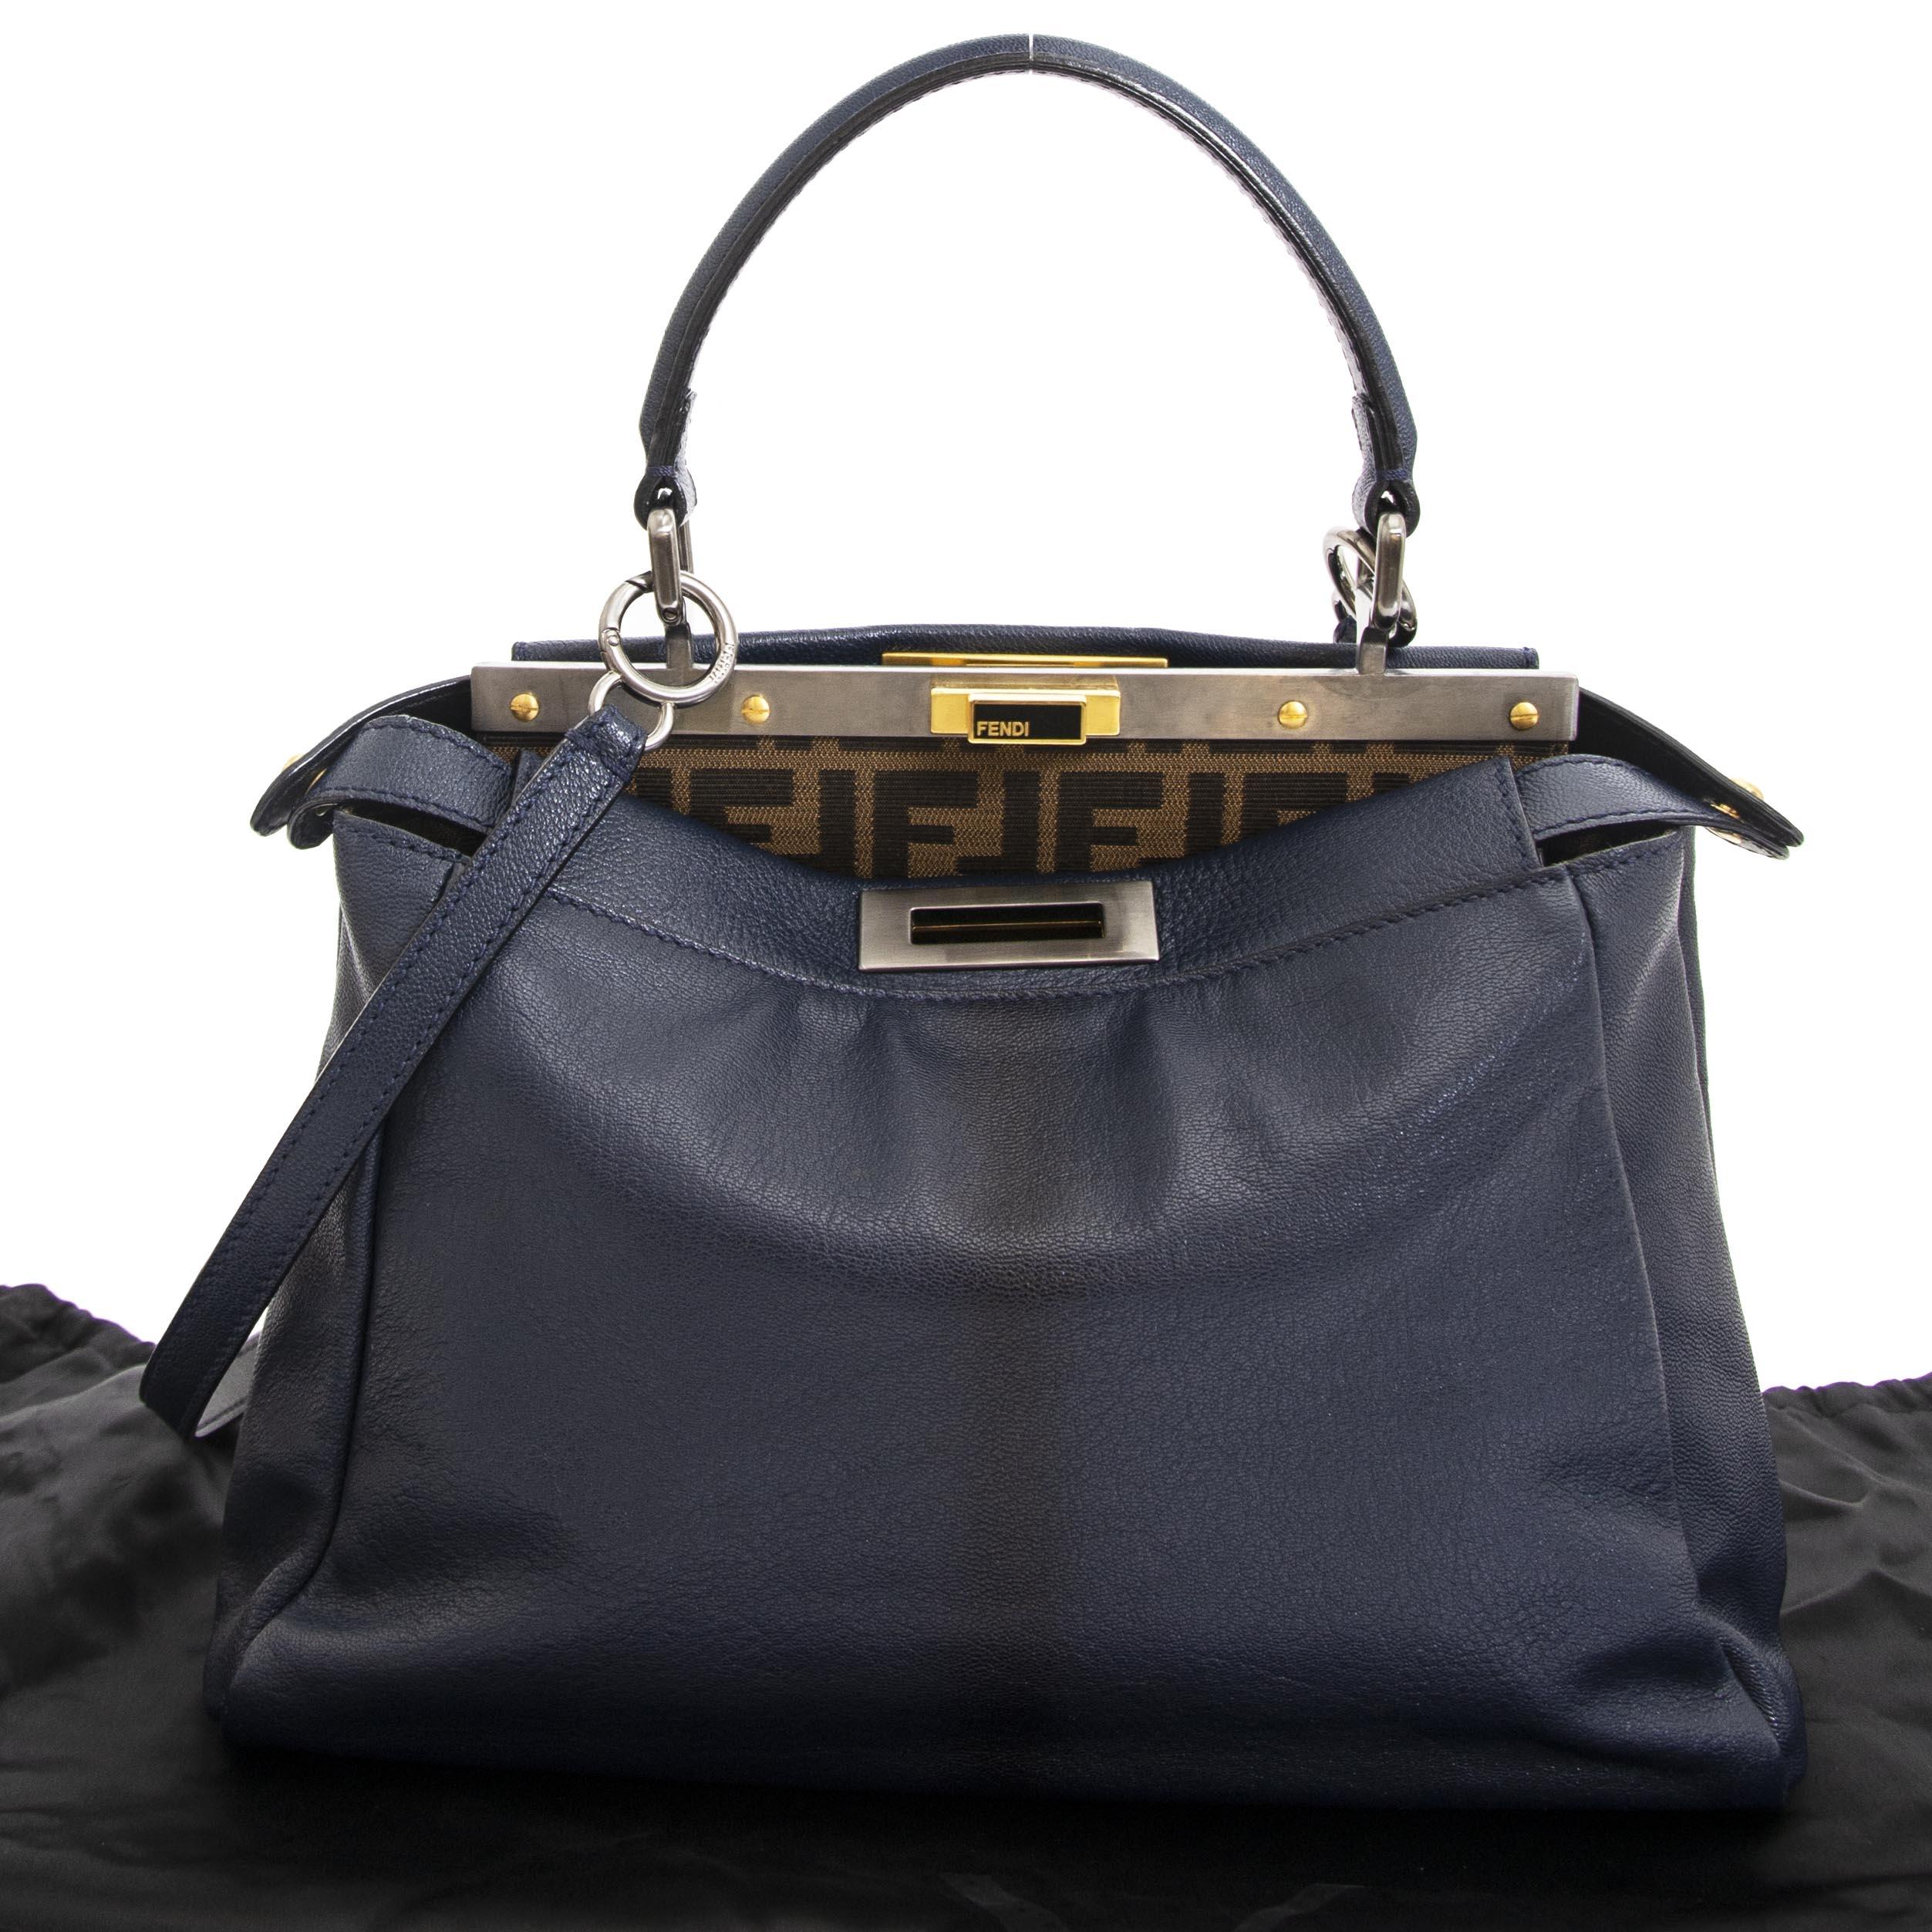 108040dcfd ... Fendi Blue Regular Peekaboo Bag now for sale at labellov vintage  fashion webshop belgium